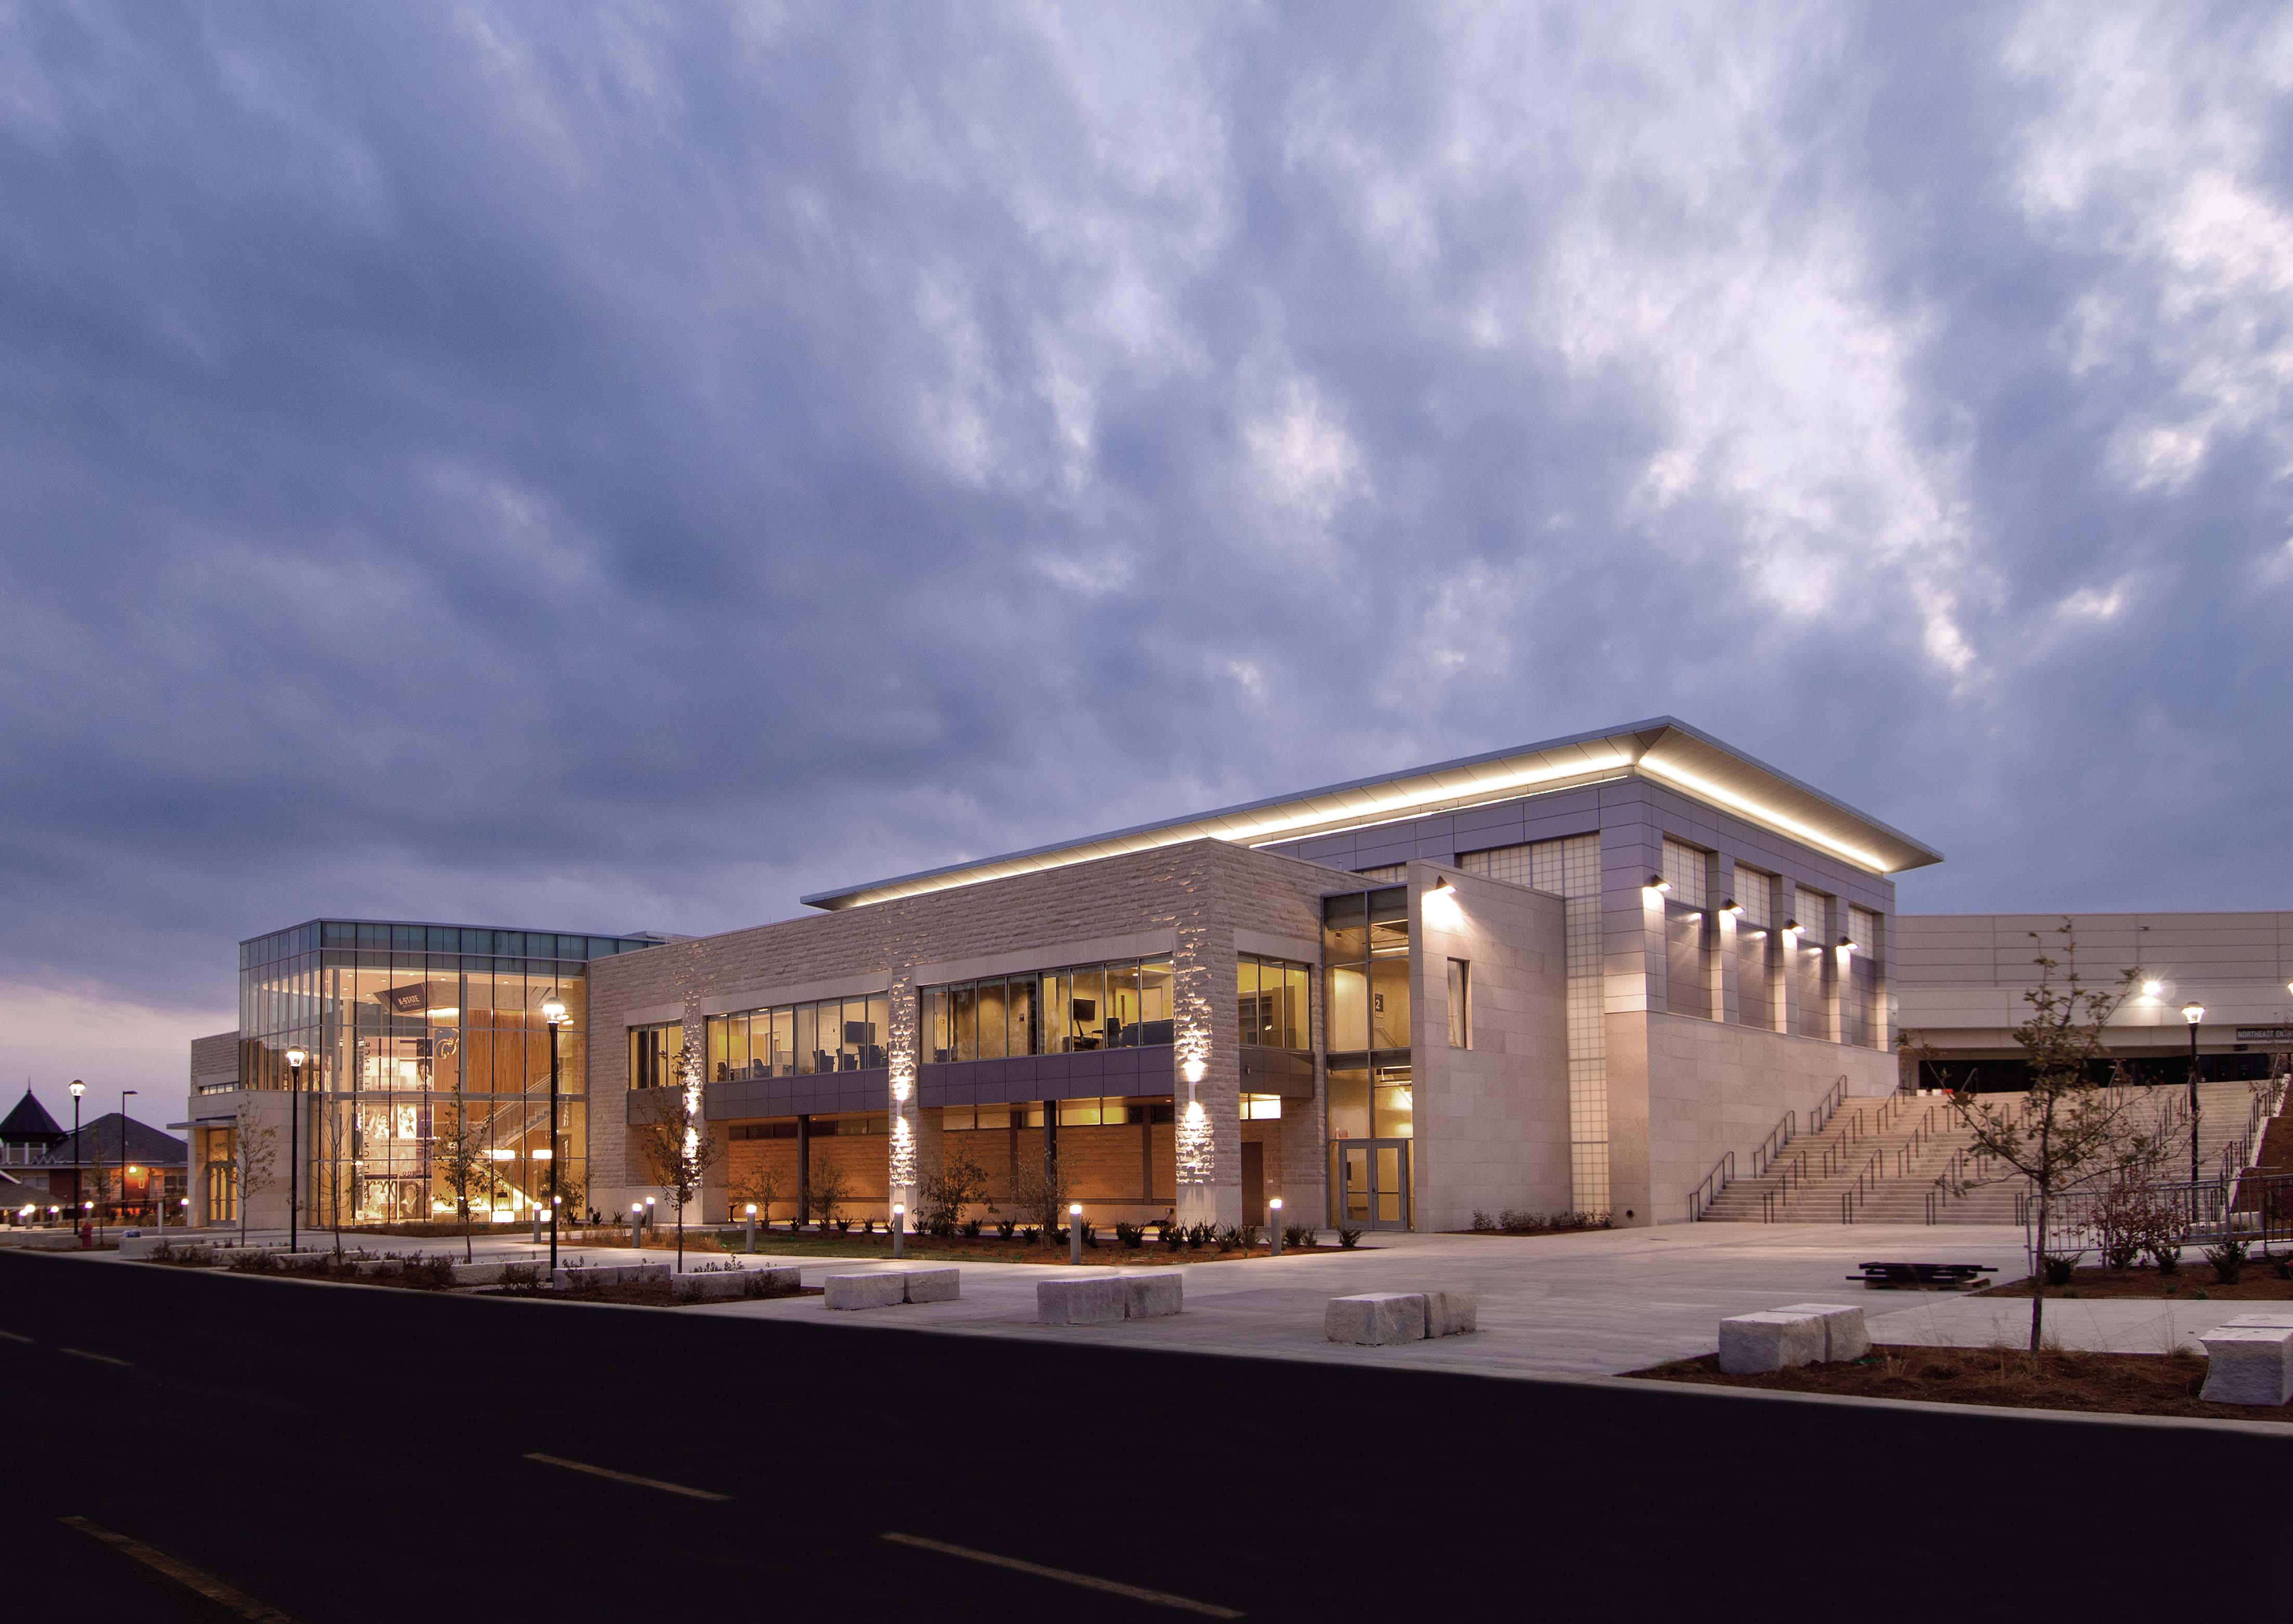 Kansas State University Basketball Training Facility